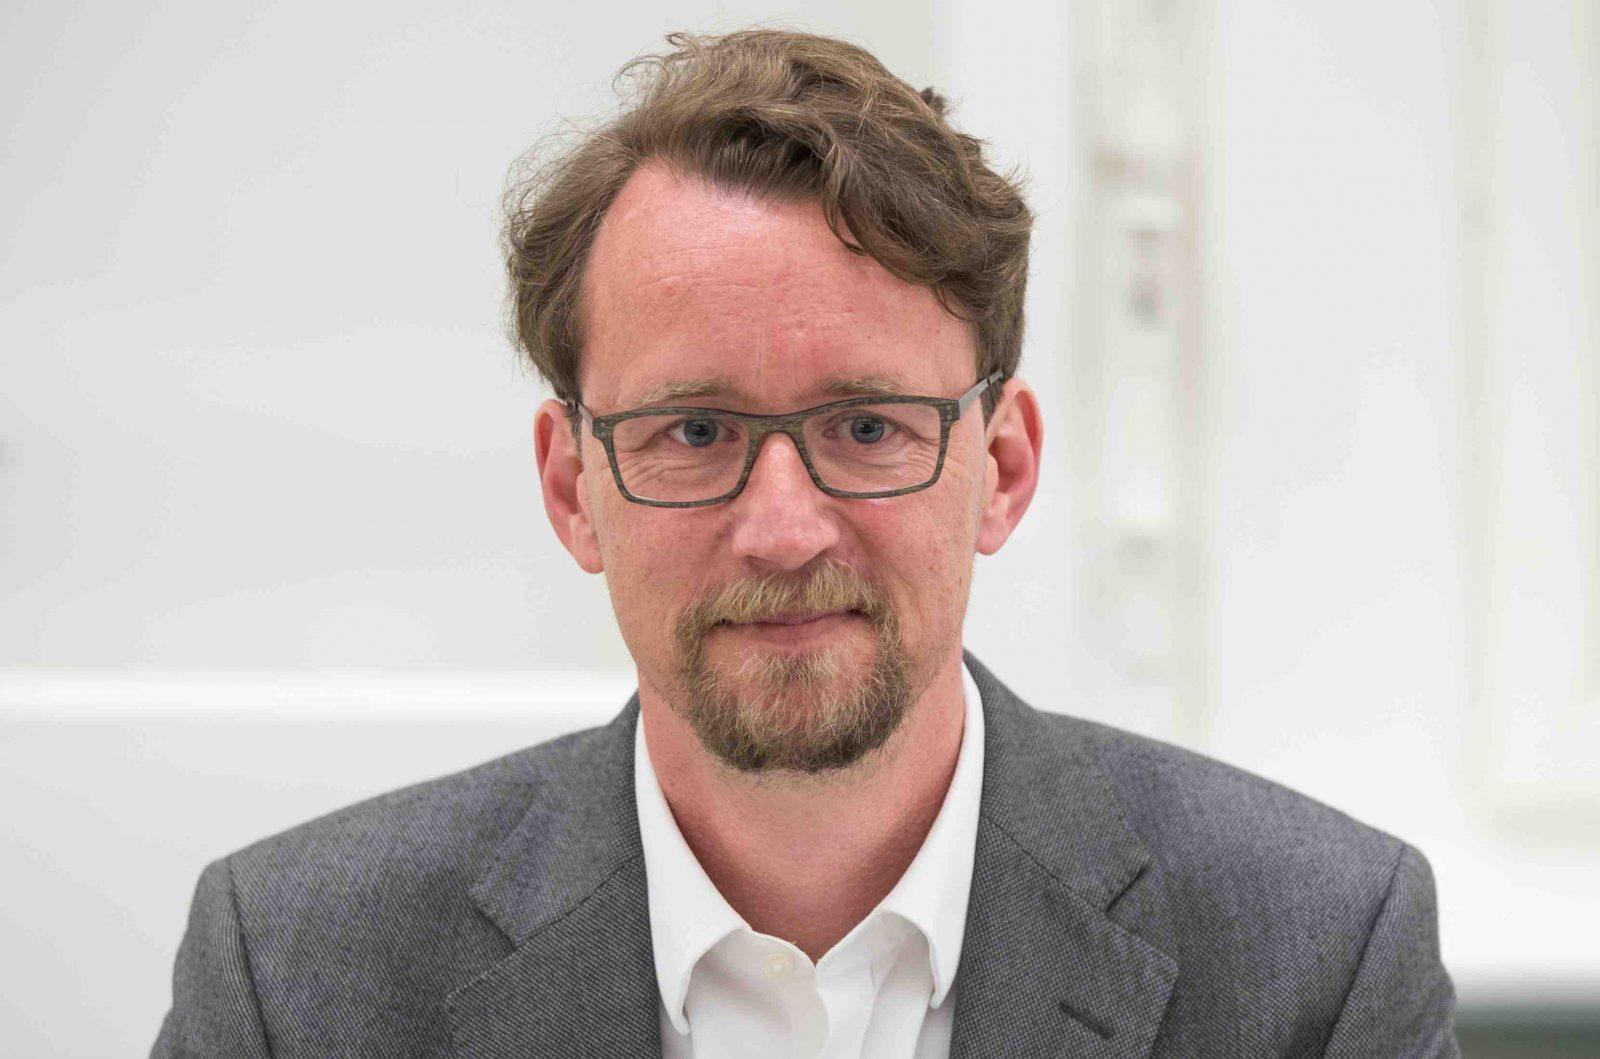 Früherer Kultusminister Brodkorb kritisiert Bildungspolitik